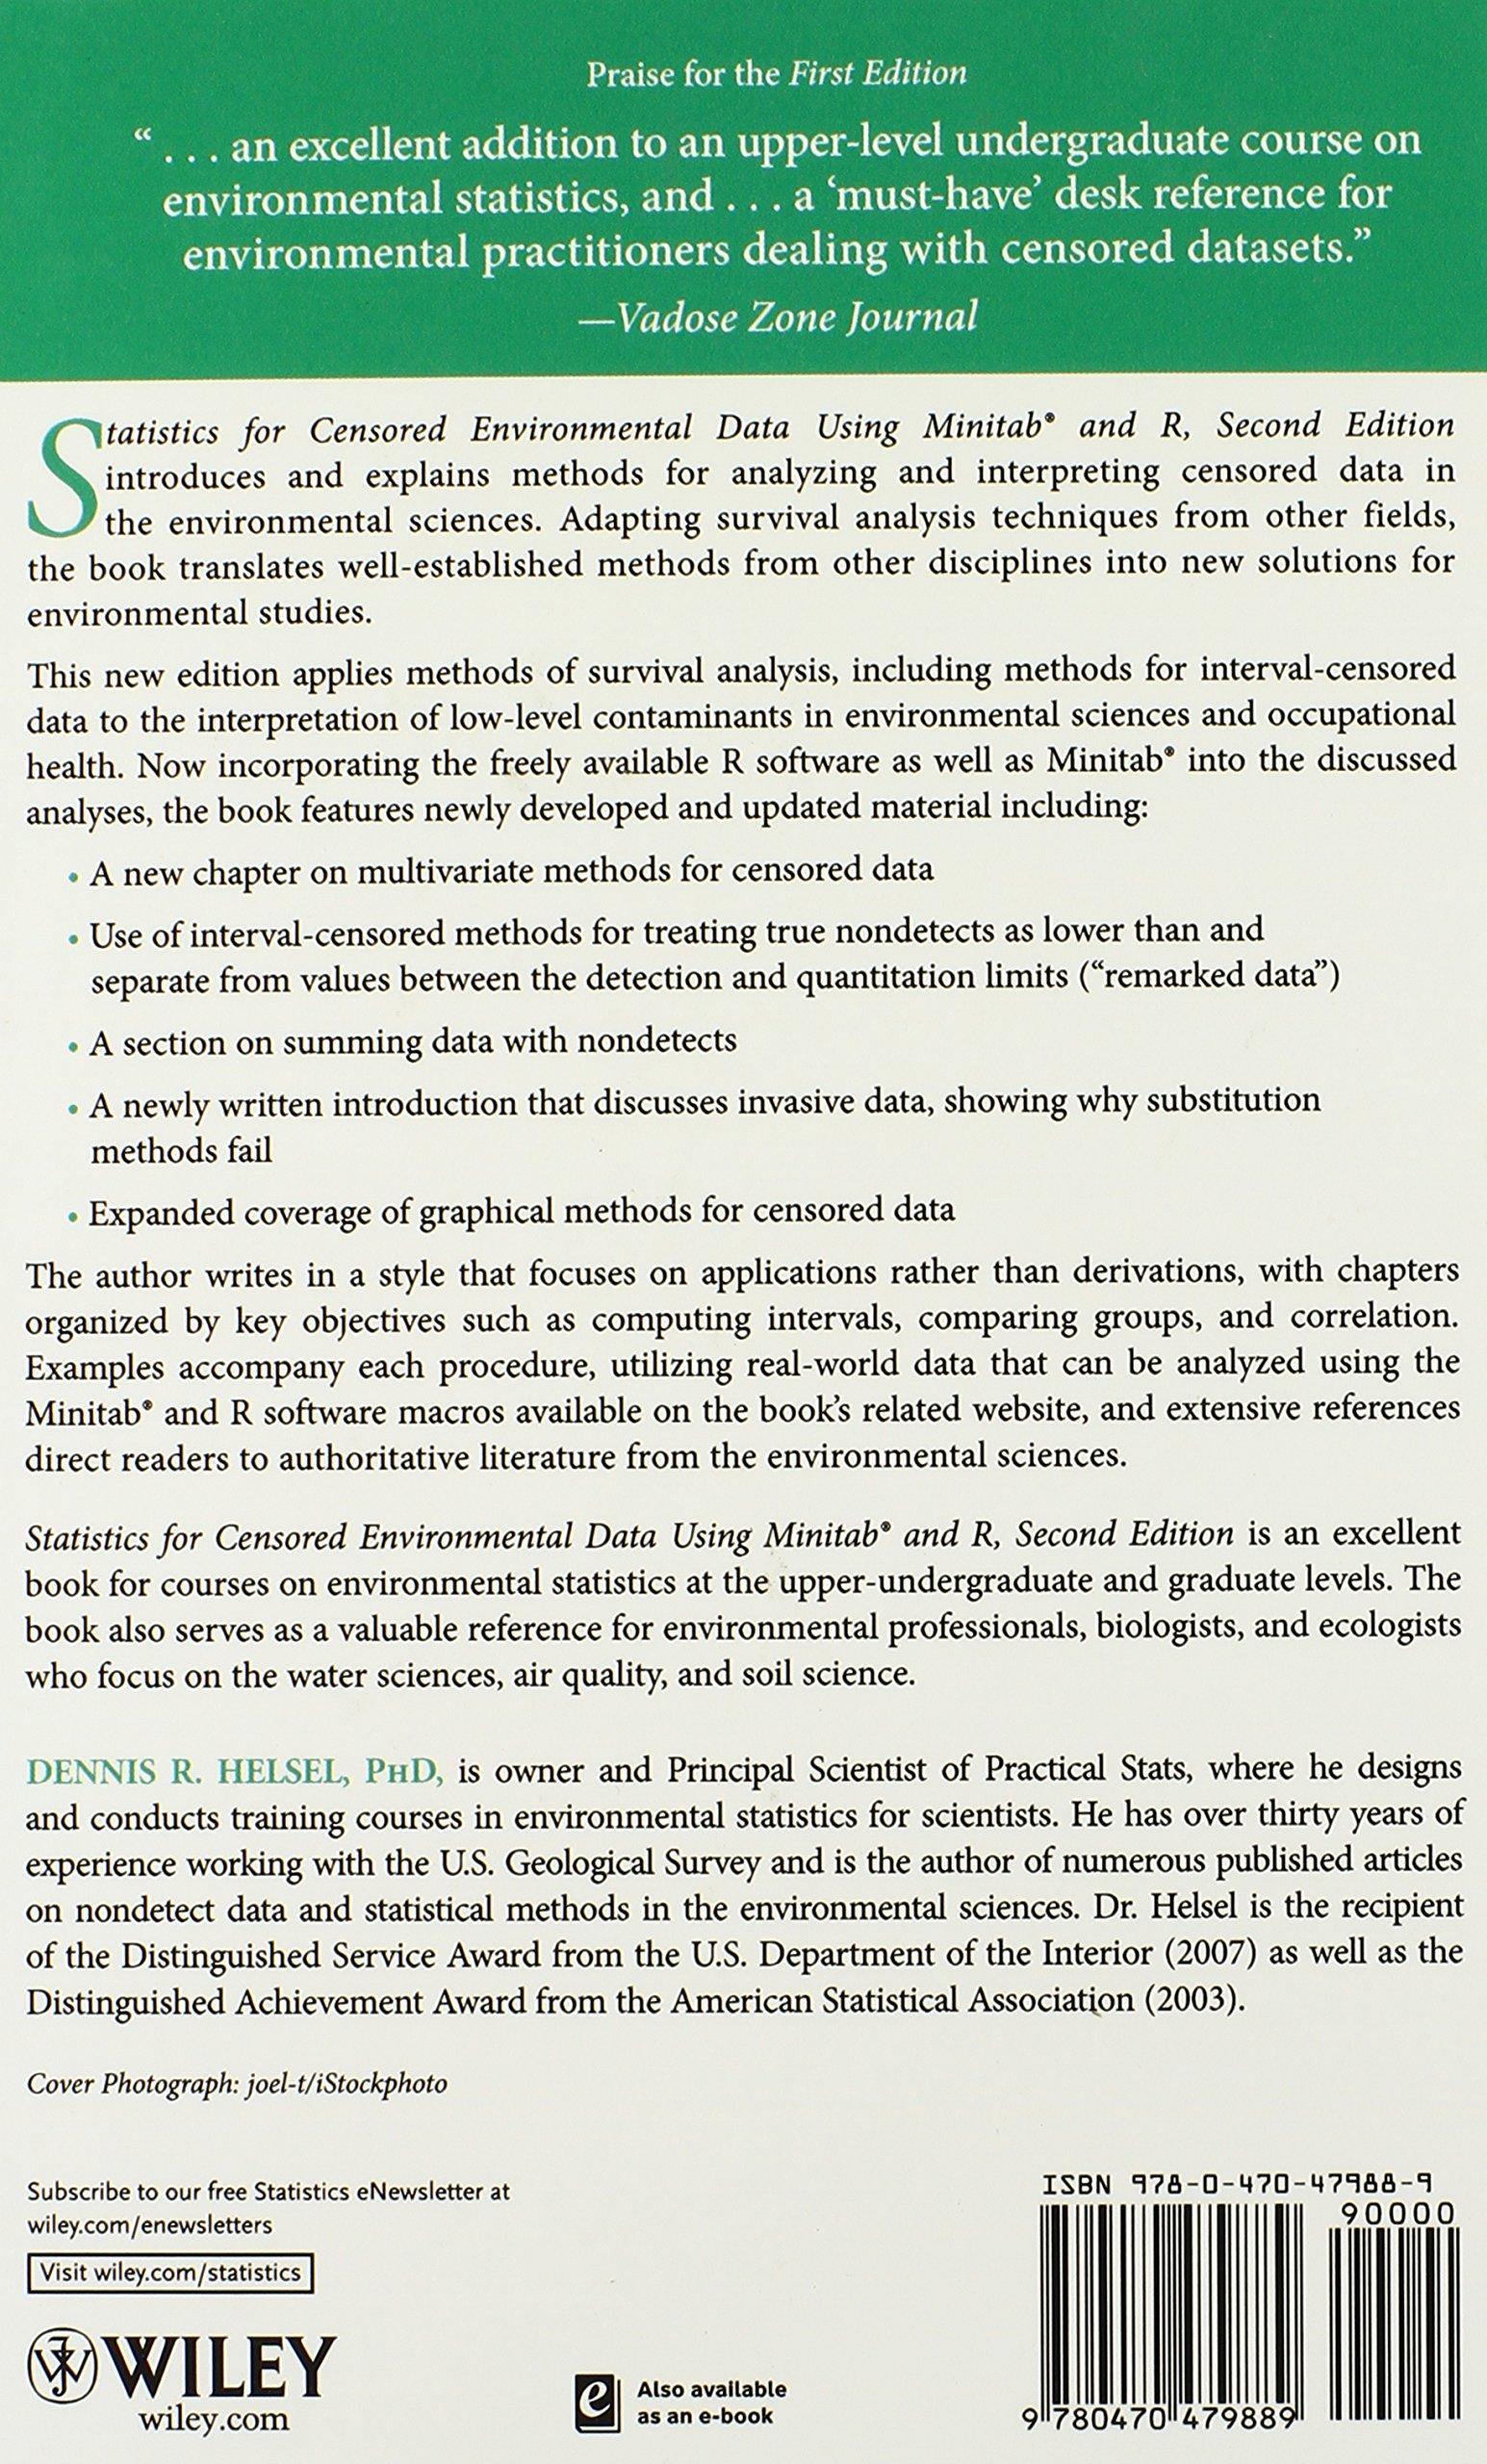 Statistics for Censored Environmental Data Using Minitab and R: Dennis R.  Helsel: 9780470479889: Books - Amazon.ca